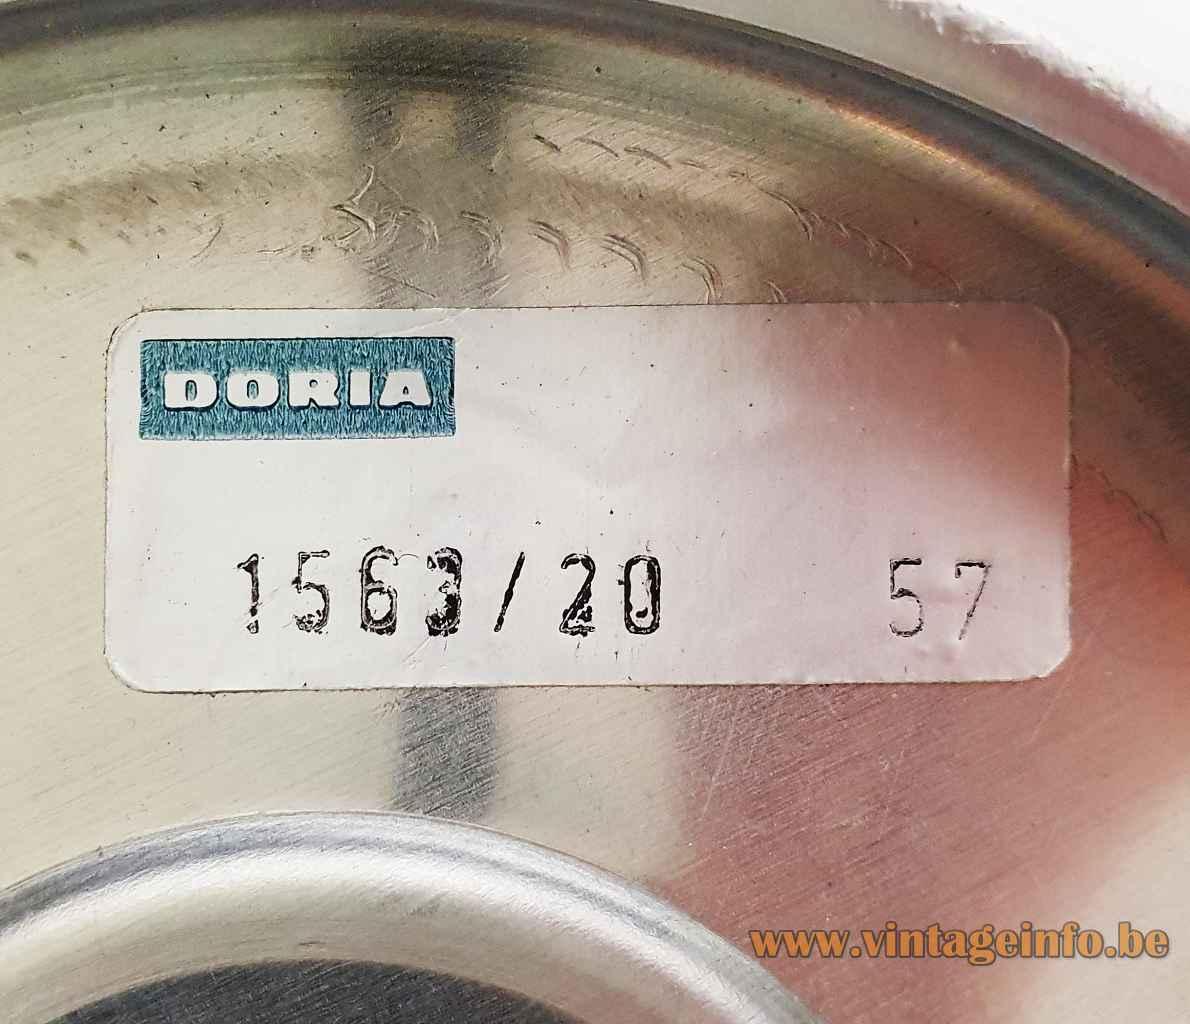 DORIA glass globe table lamp 1563/20 rectangular paper label inside 1970s Germany